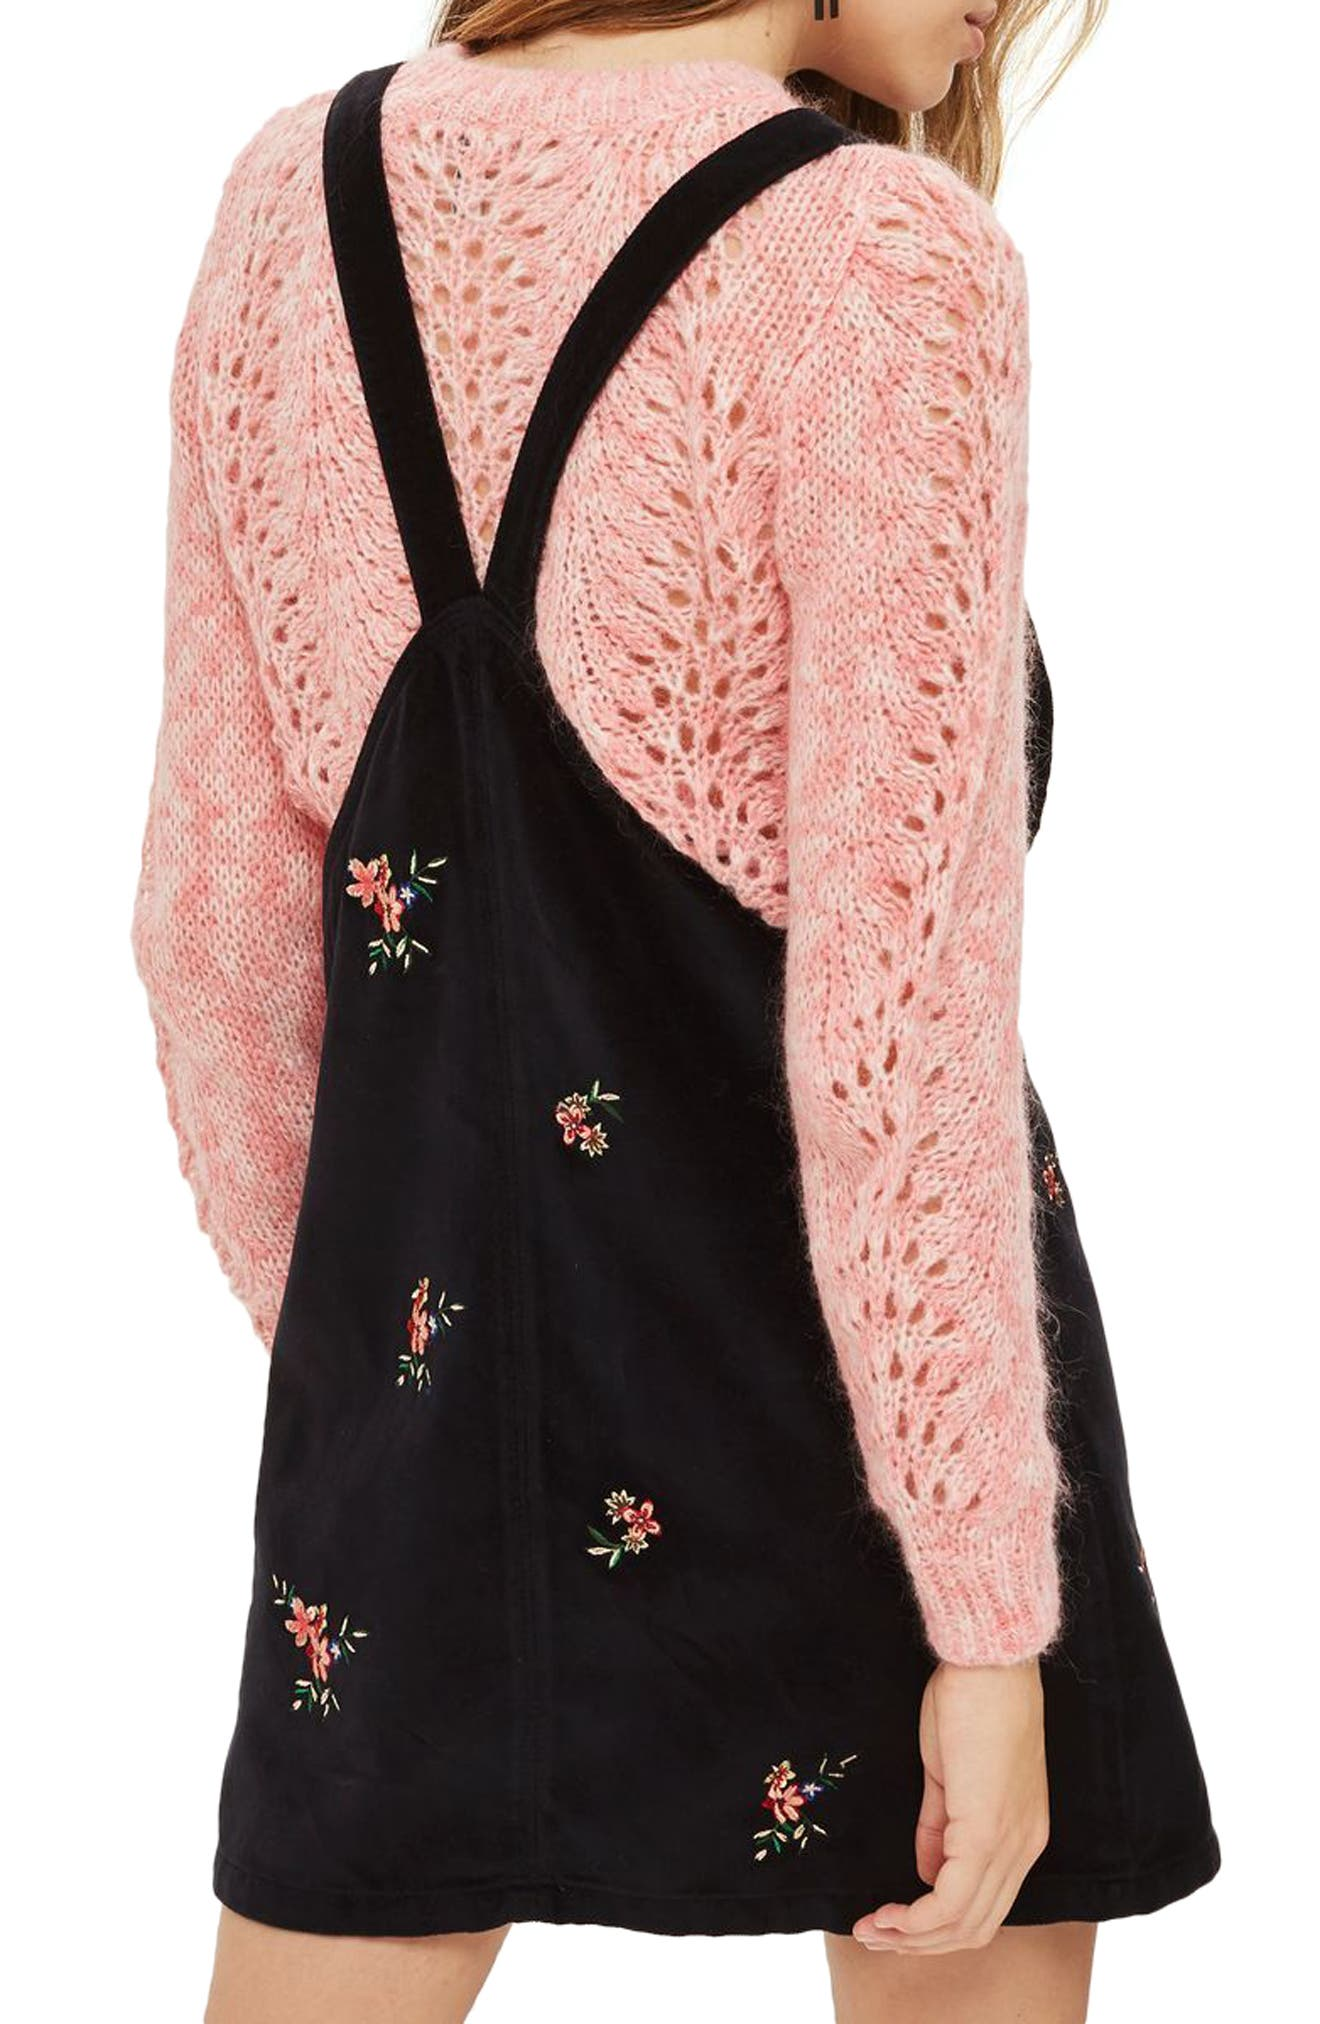 Embroidered Velvet Pinafore Dress,                             Alternate thumbnail 2, color,                             Black Multi